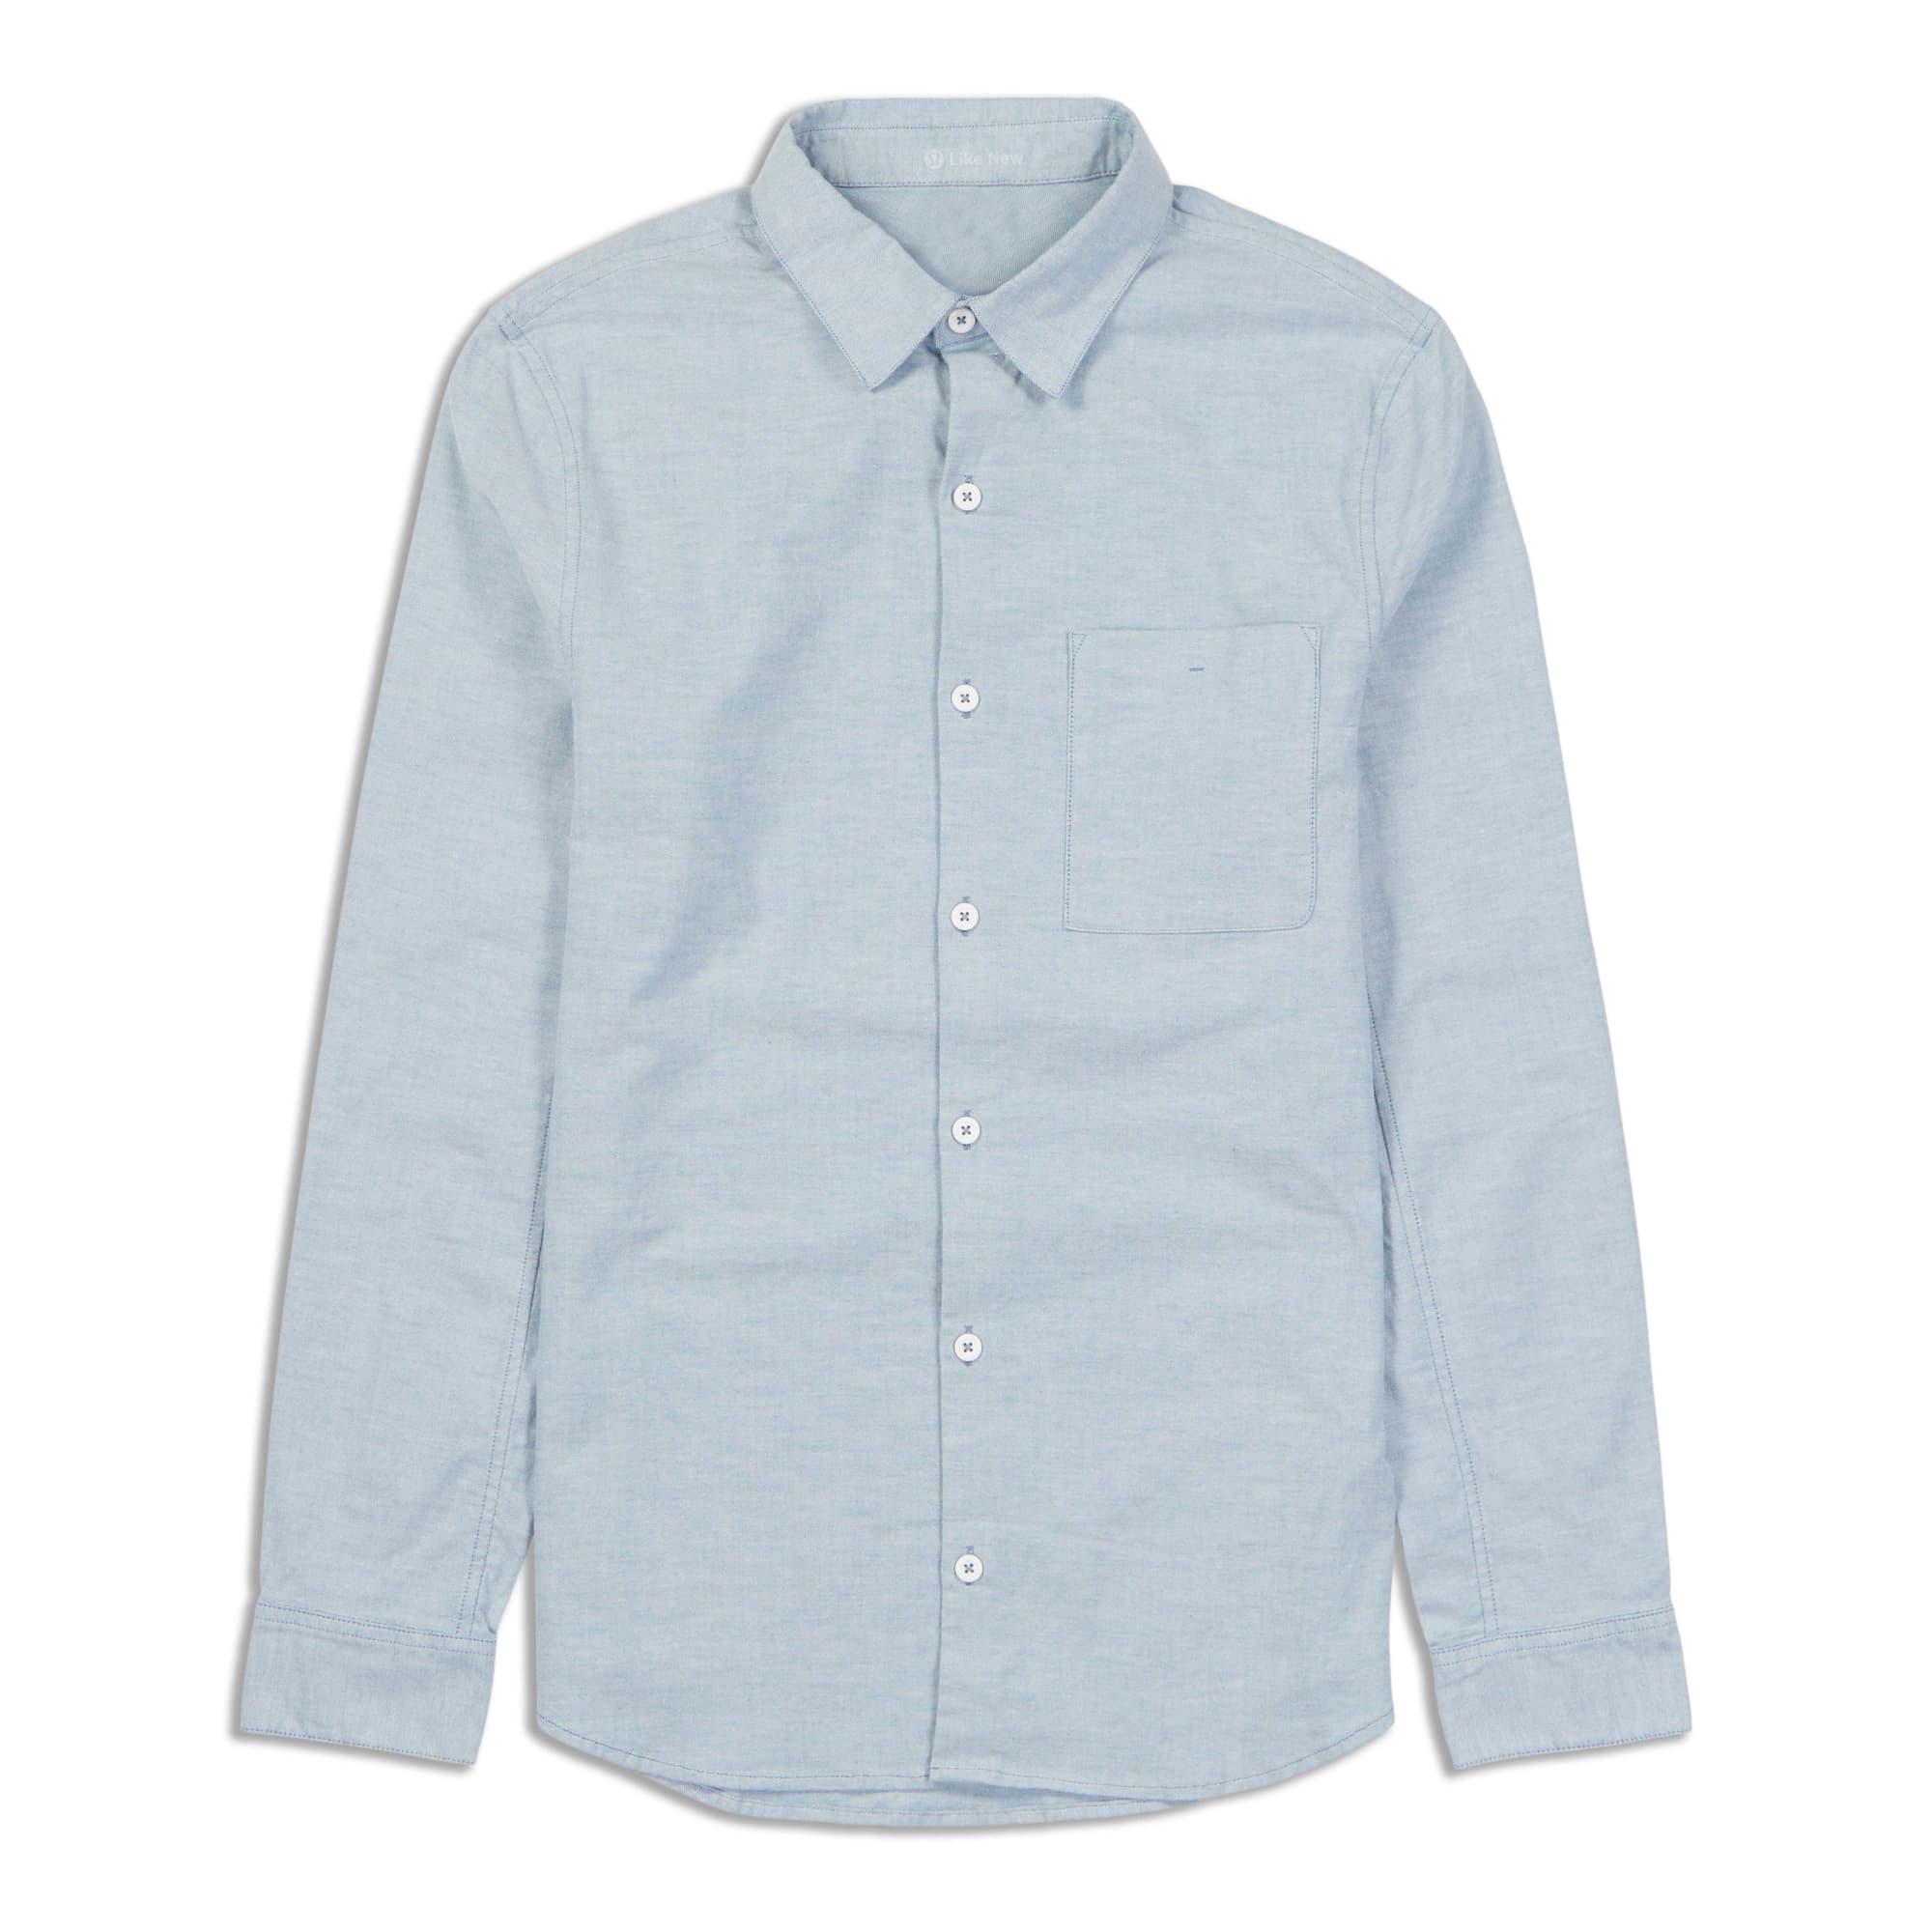 Main product image: Men's Long Sleeve Shirt - Resale